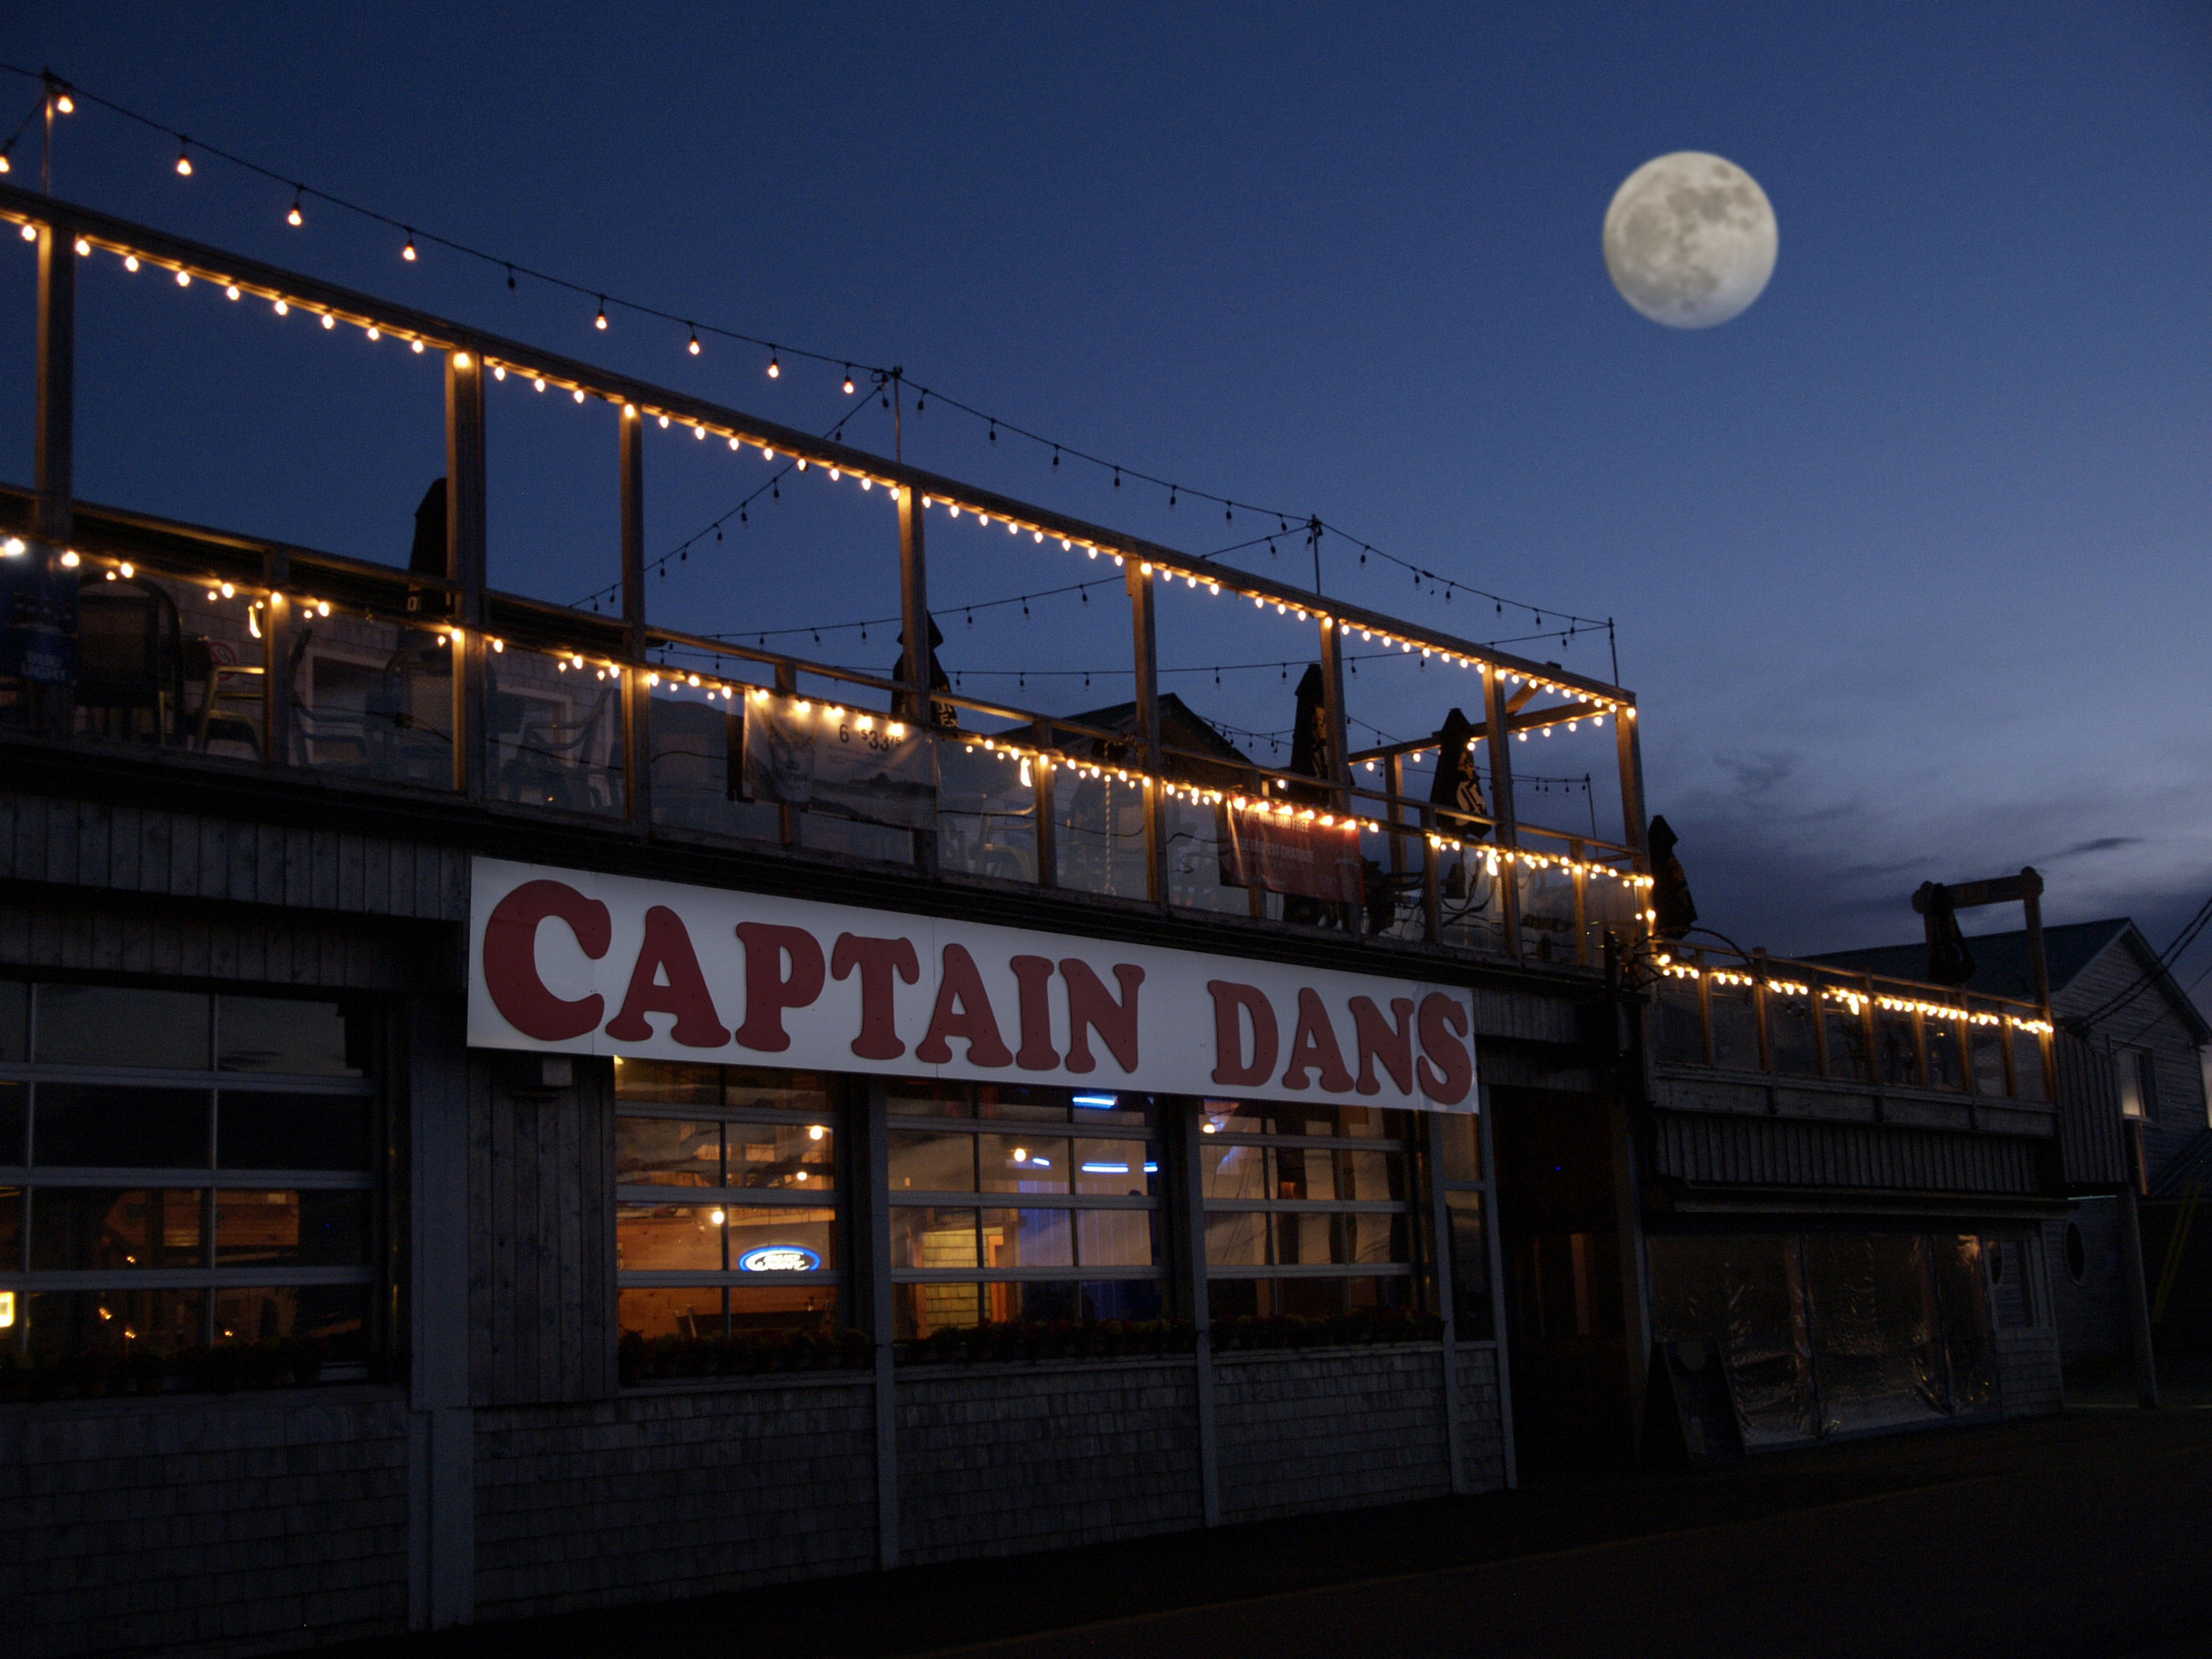 Captain Dan's Ext. night.jpg